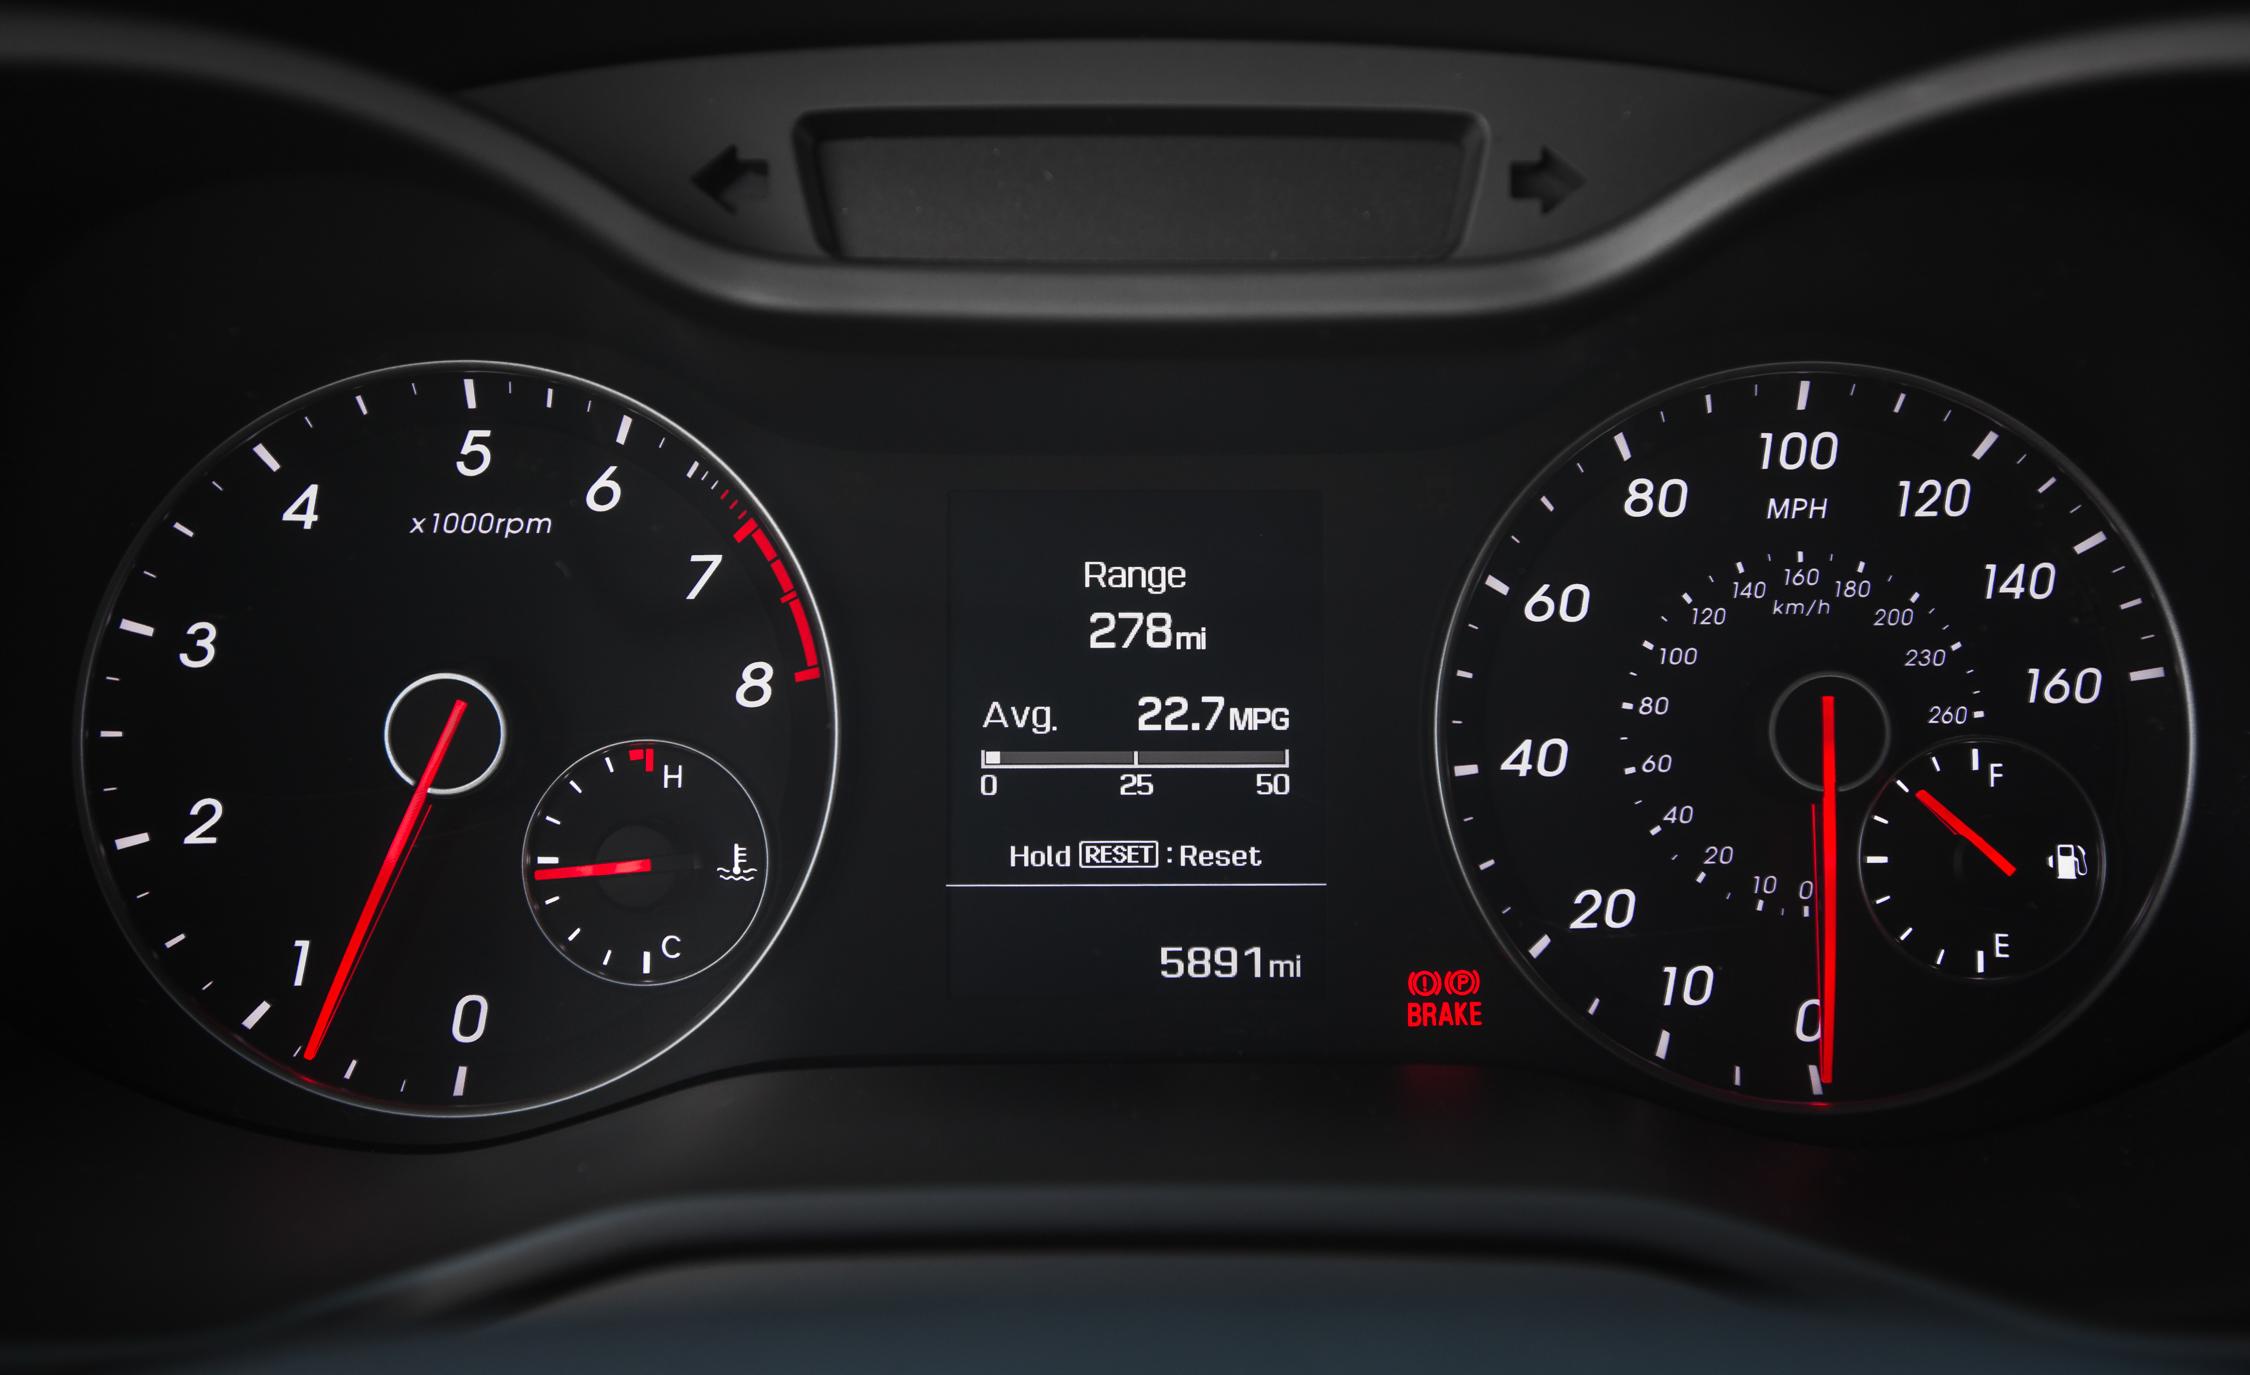 2016 Hyundai Veloster Turbo Rally Edition Interior Speedometer